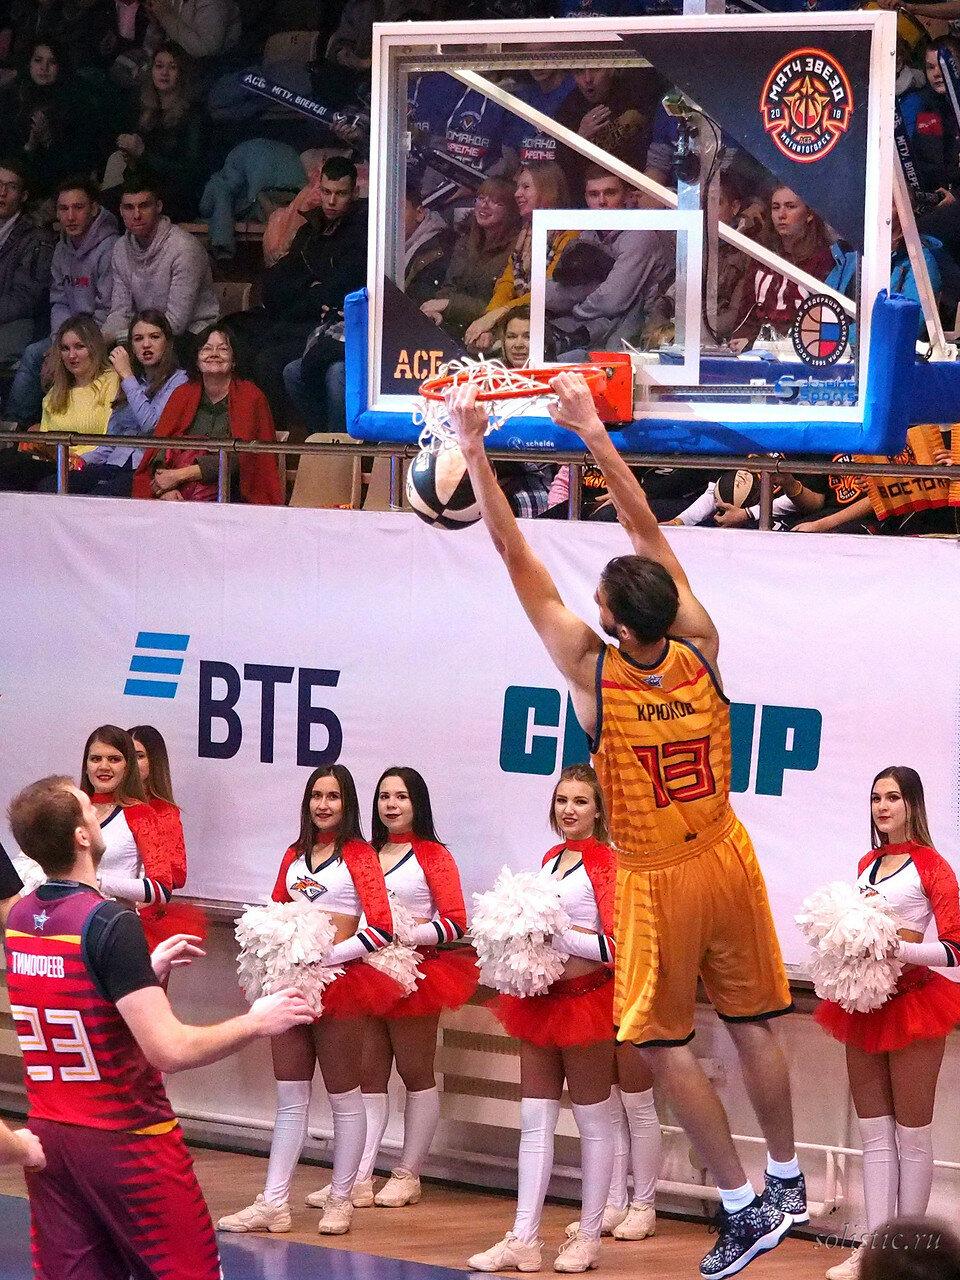 72 Матч звезд АСБ 2018 (ассоциации студенческого баскетбола)